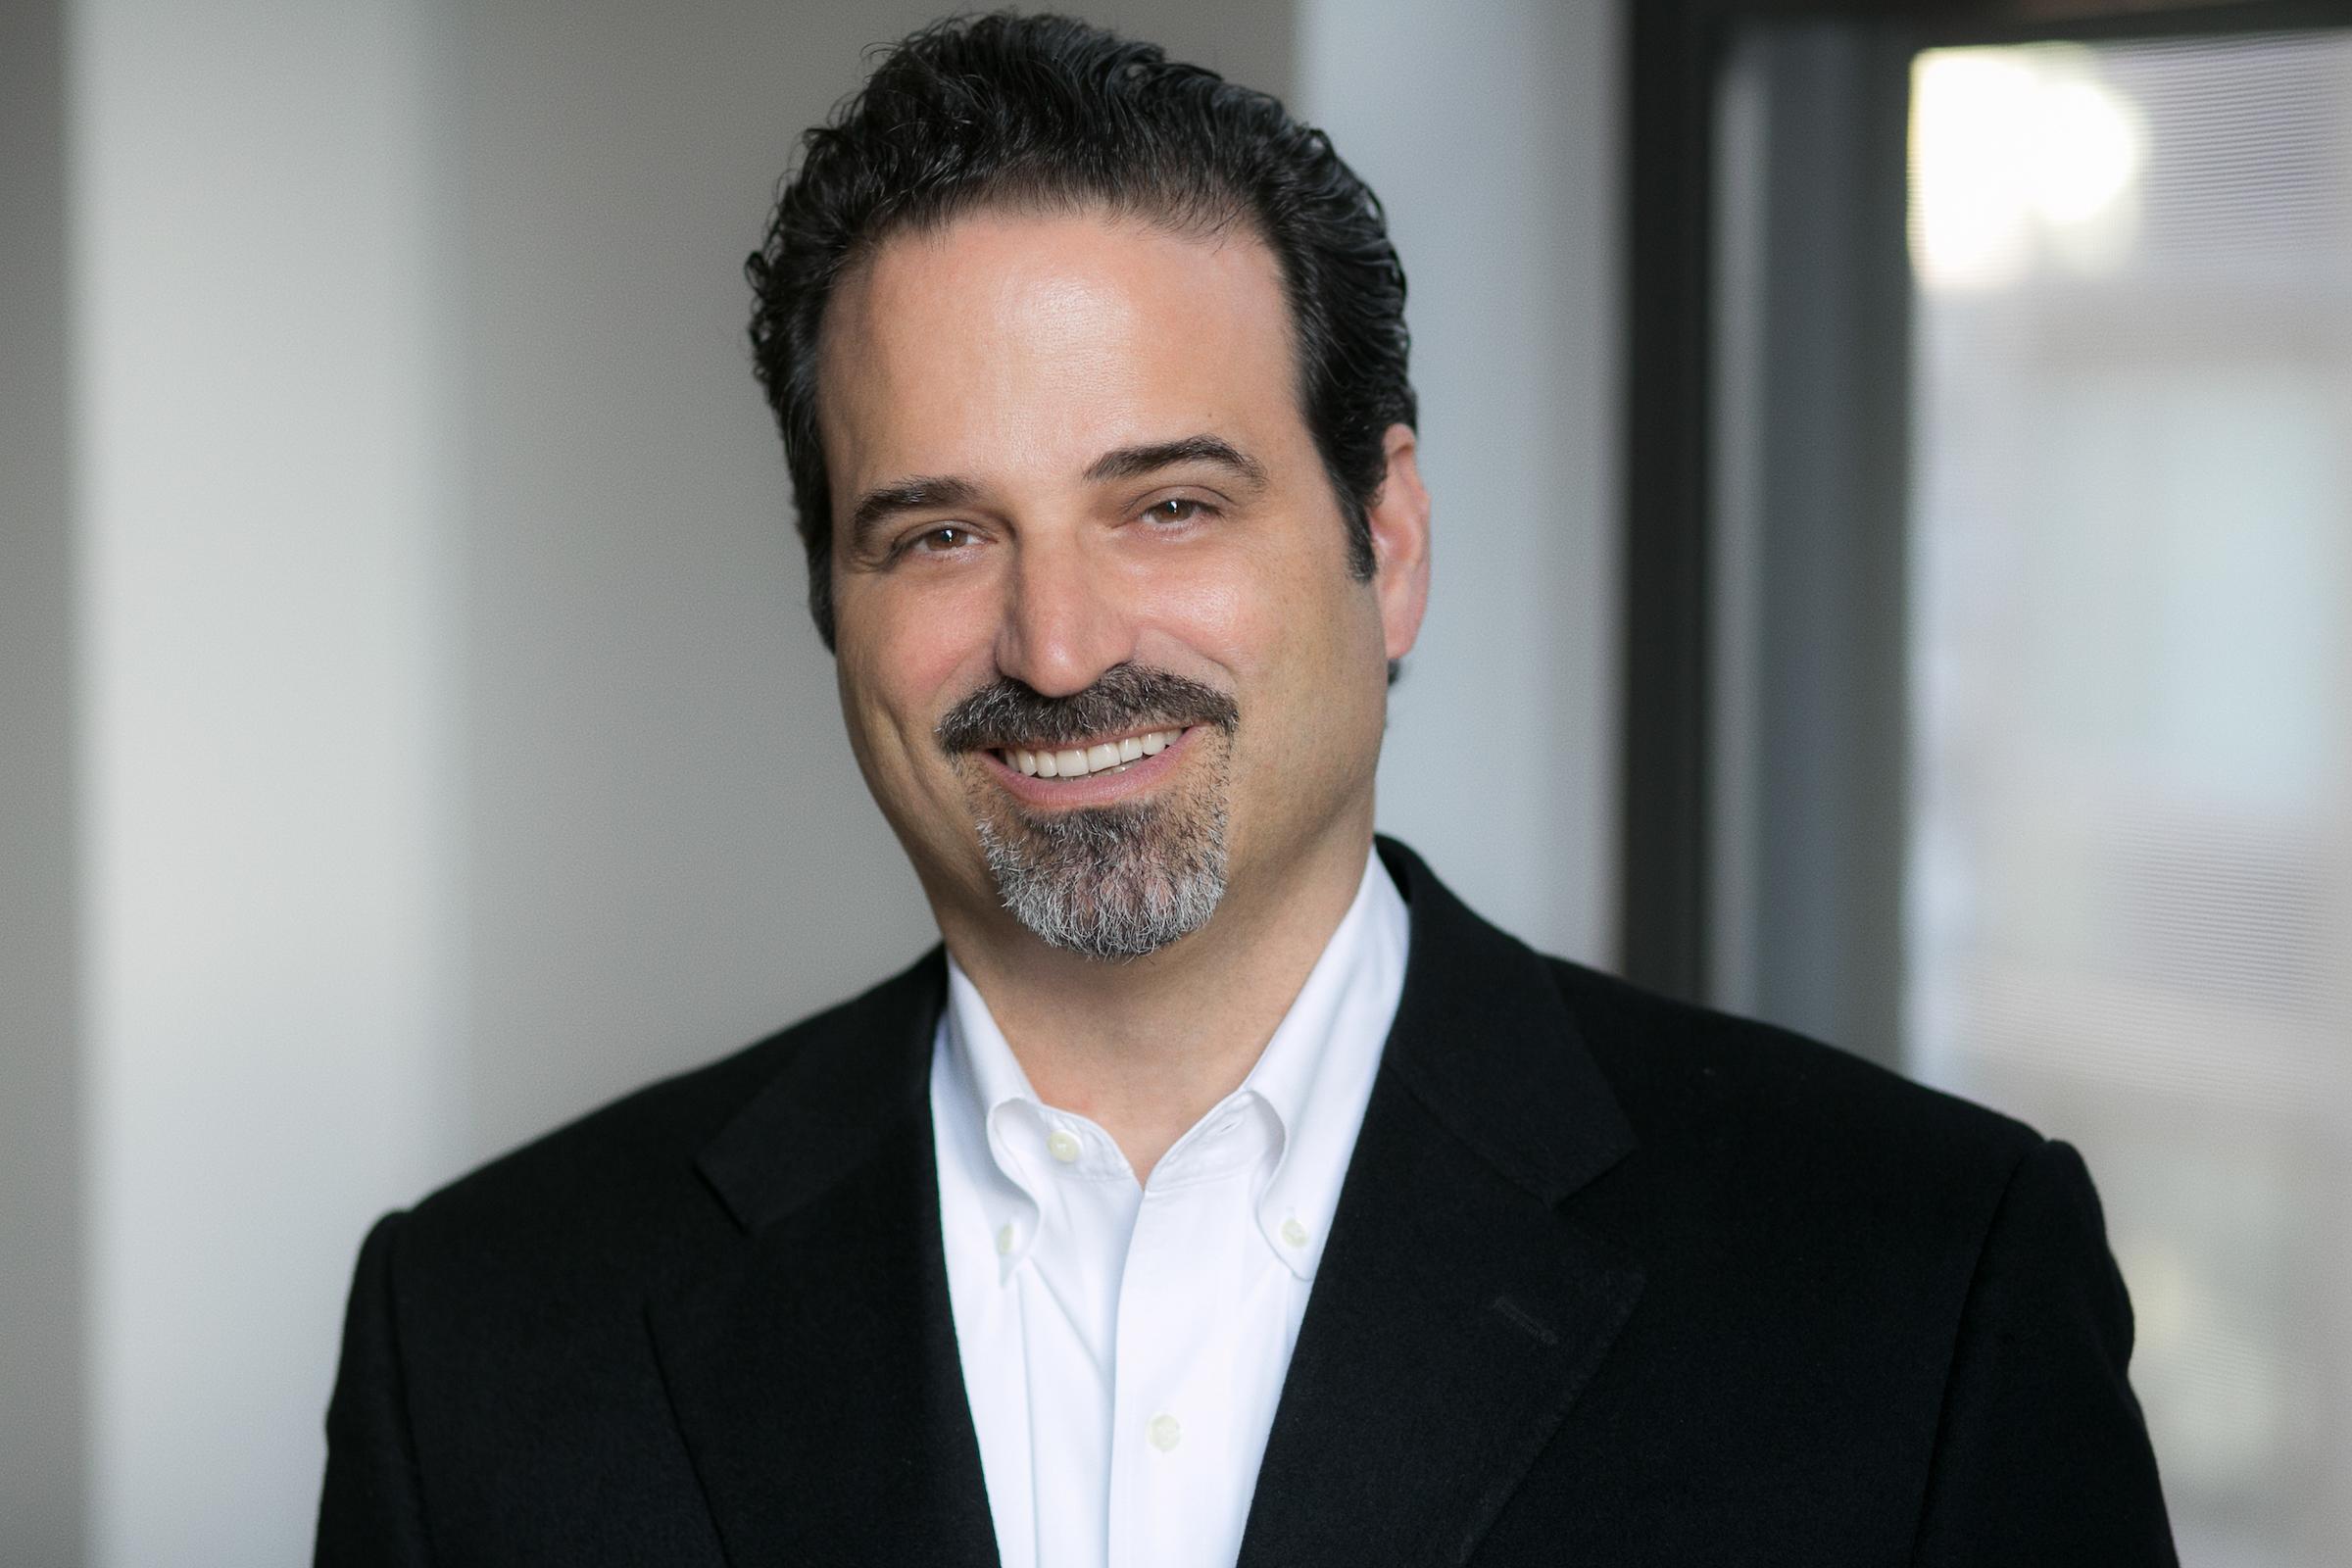 Mark Naples